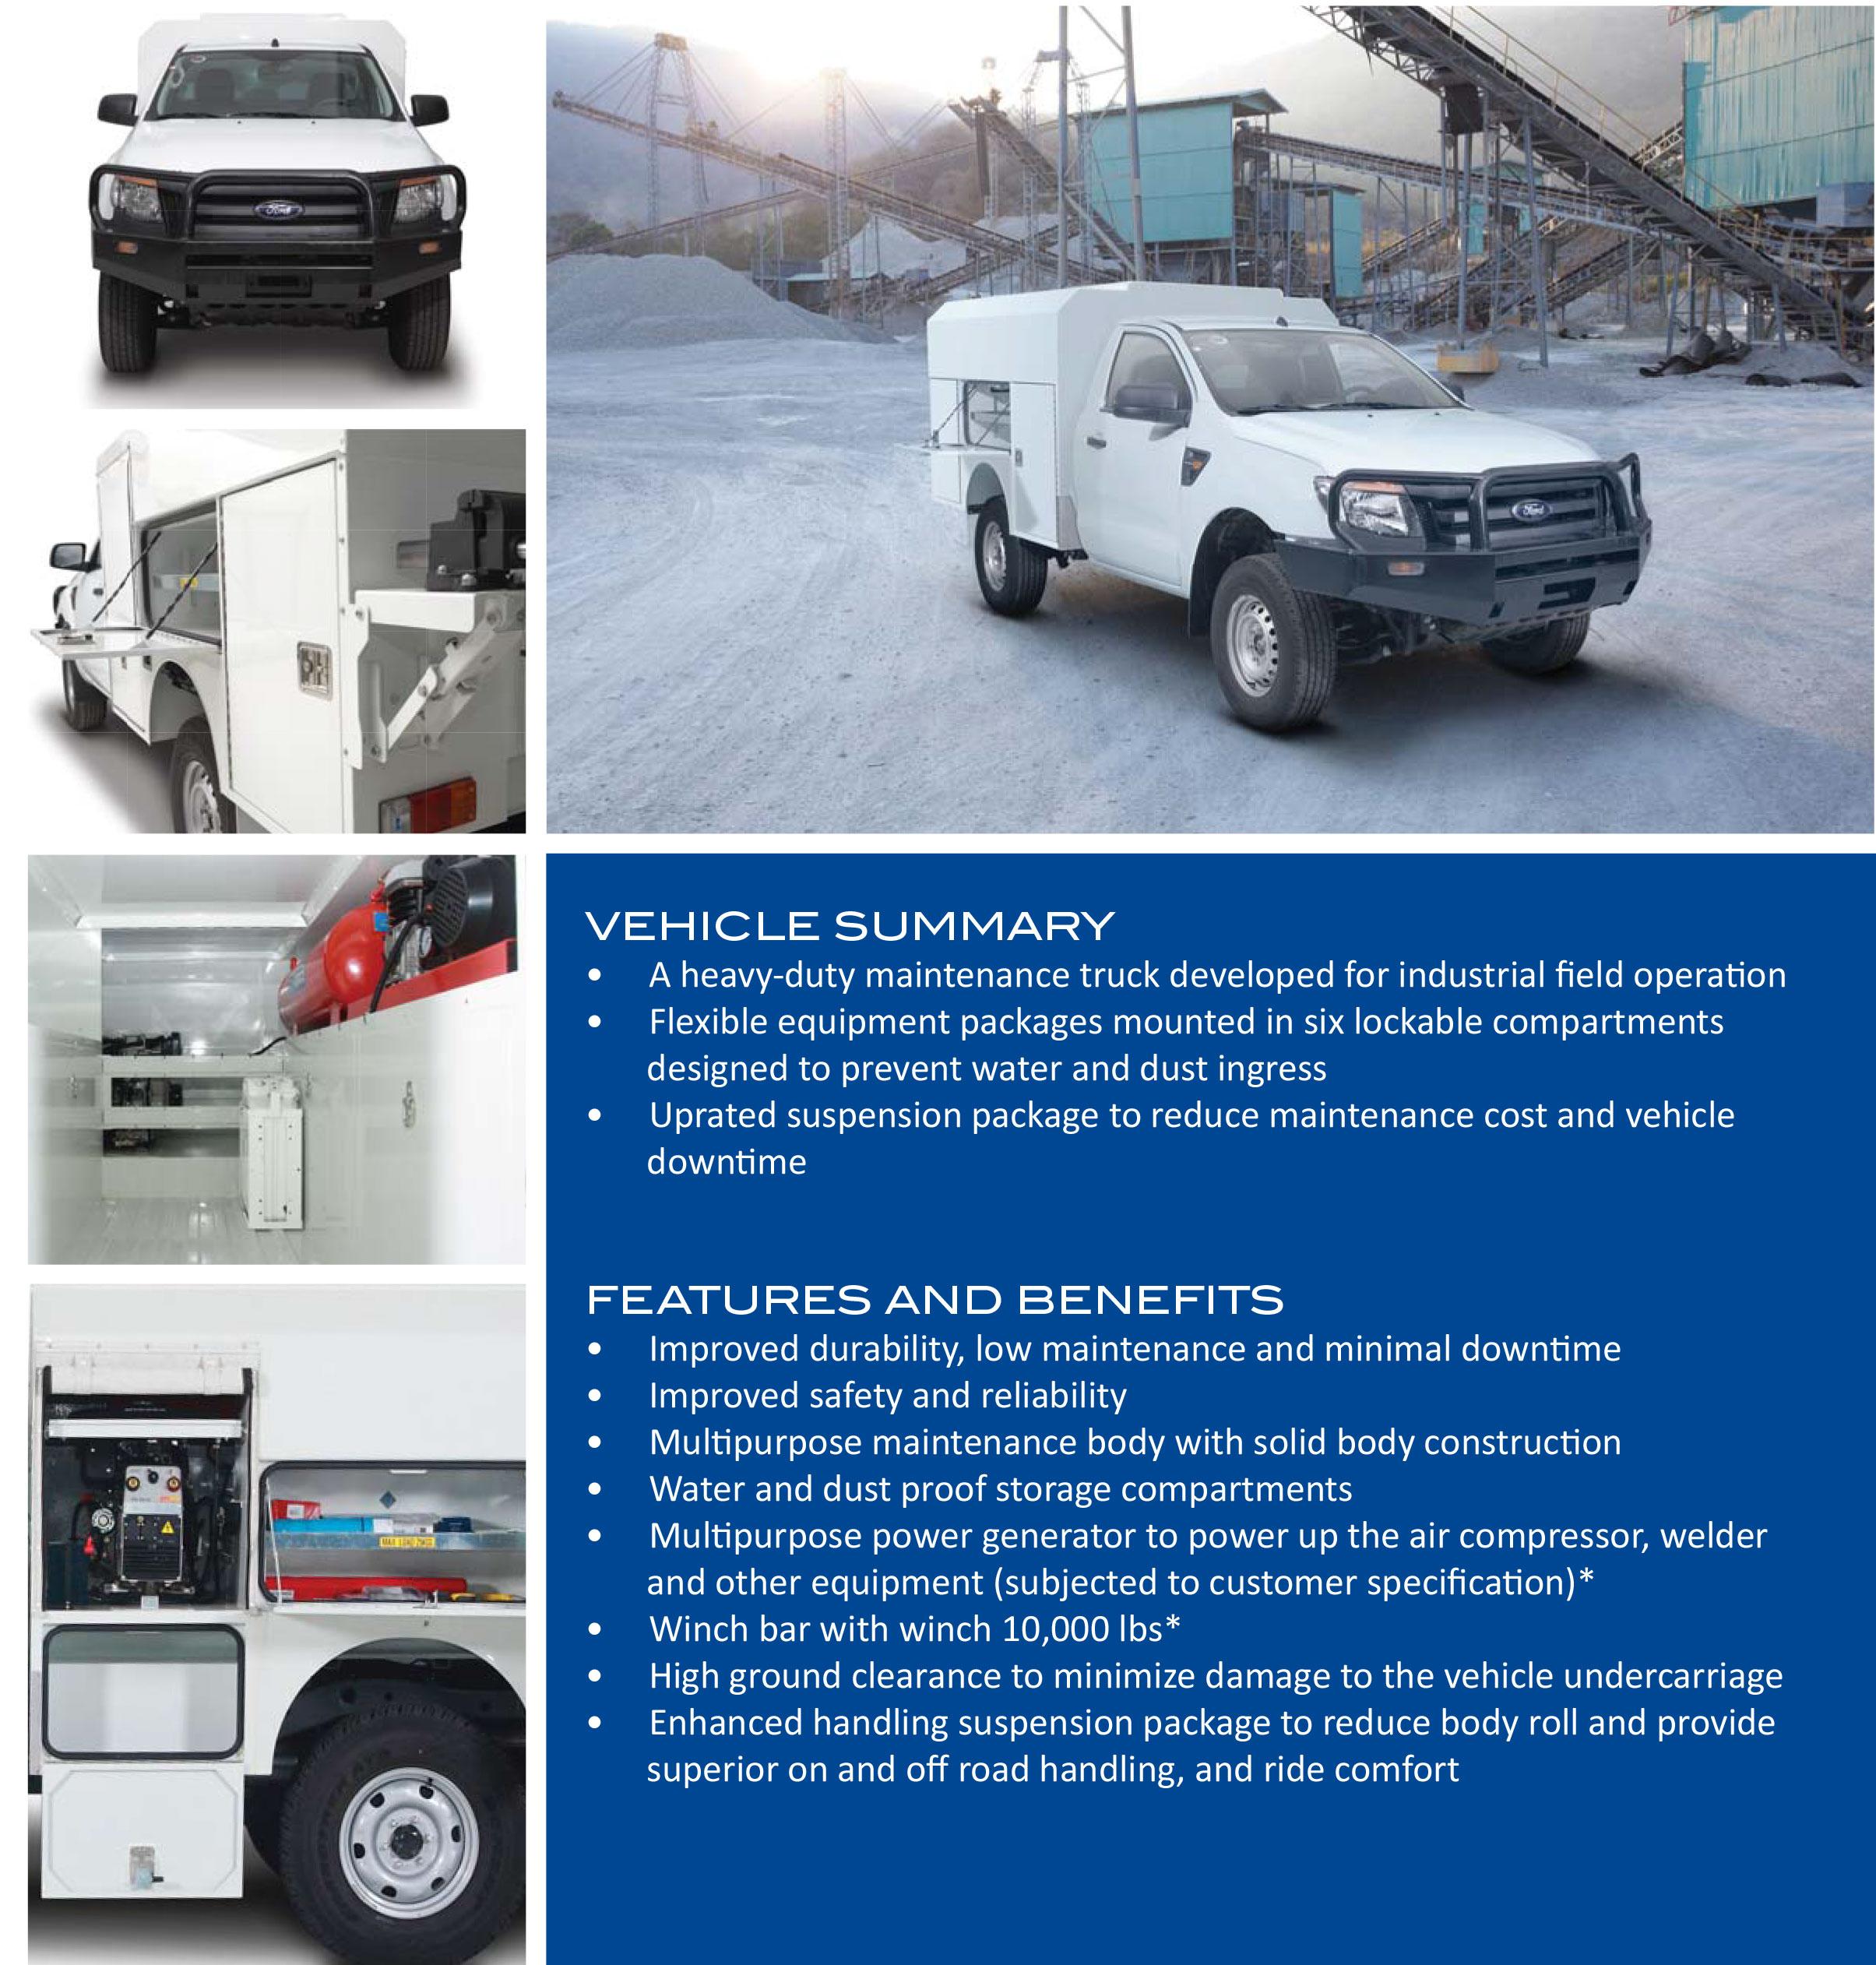 ford-maintenance-vihicle